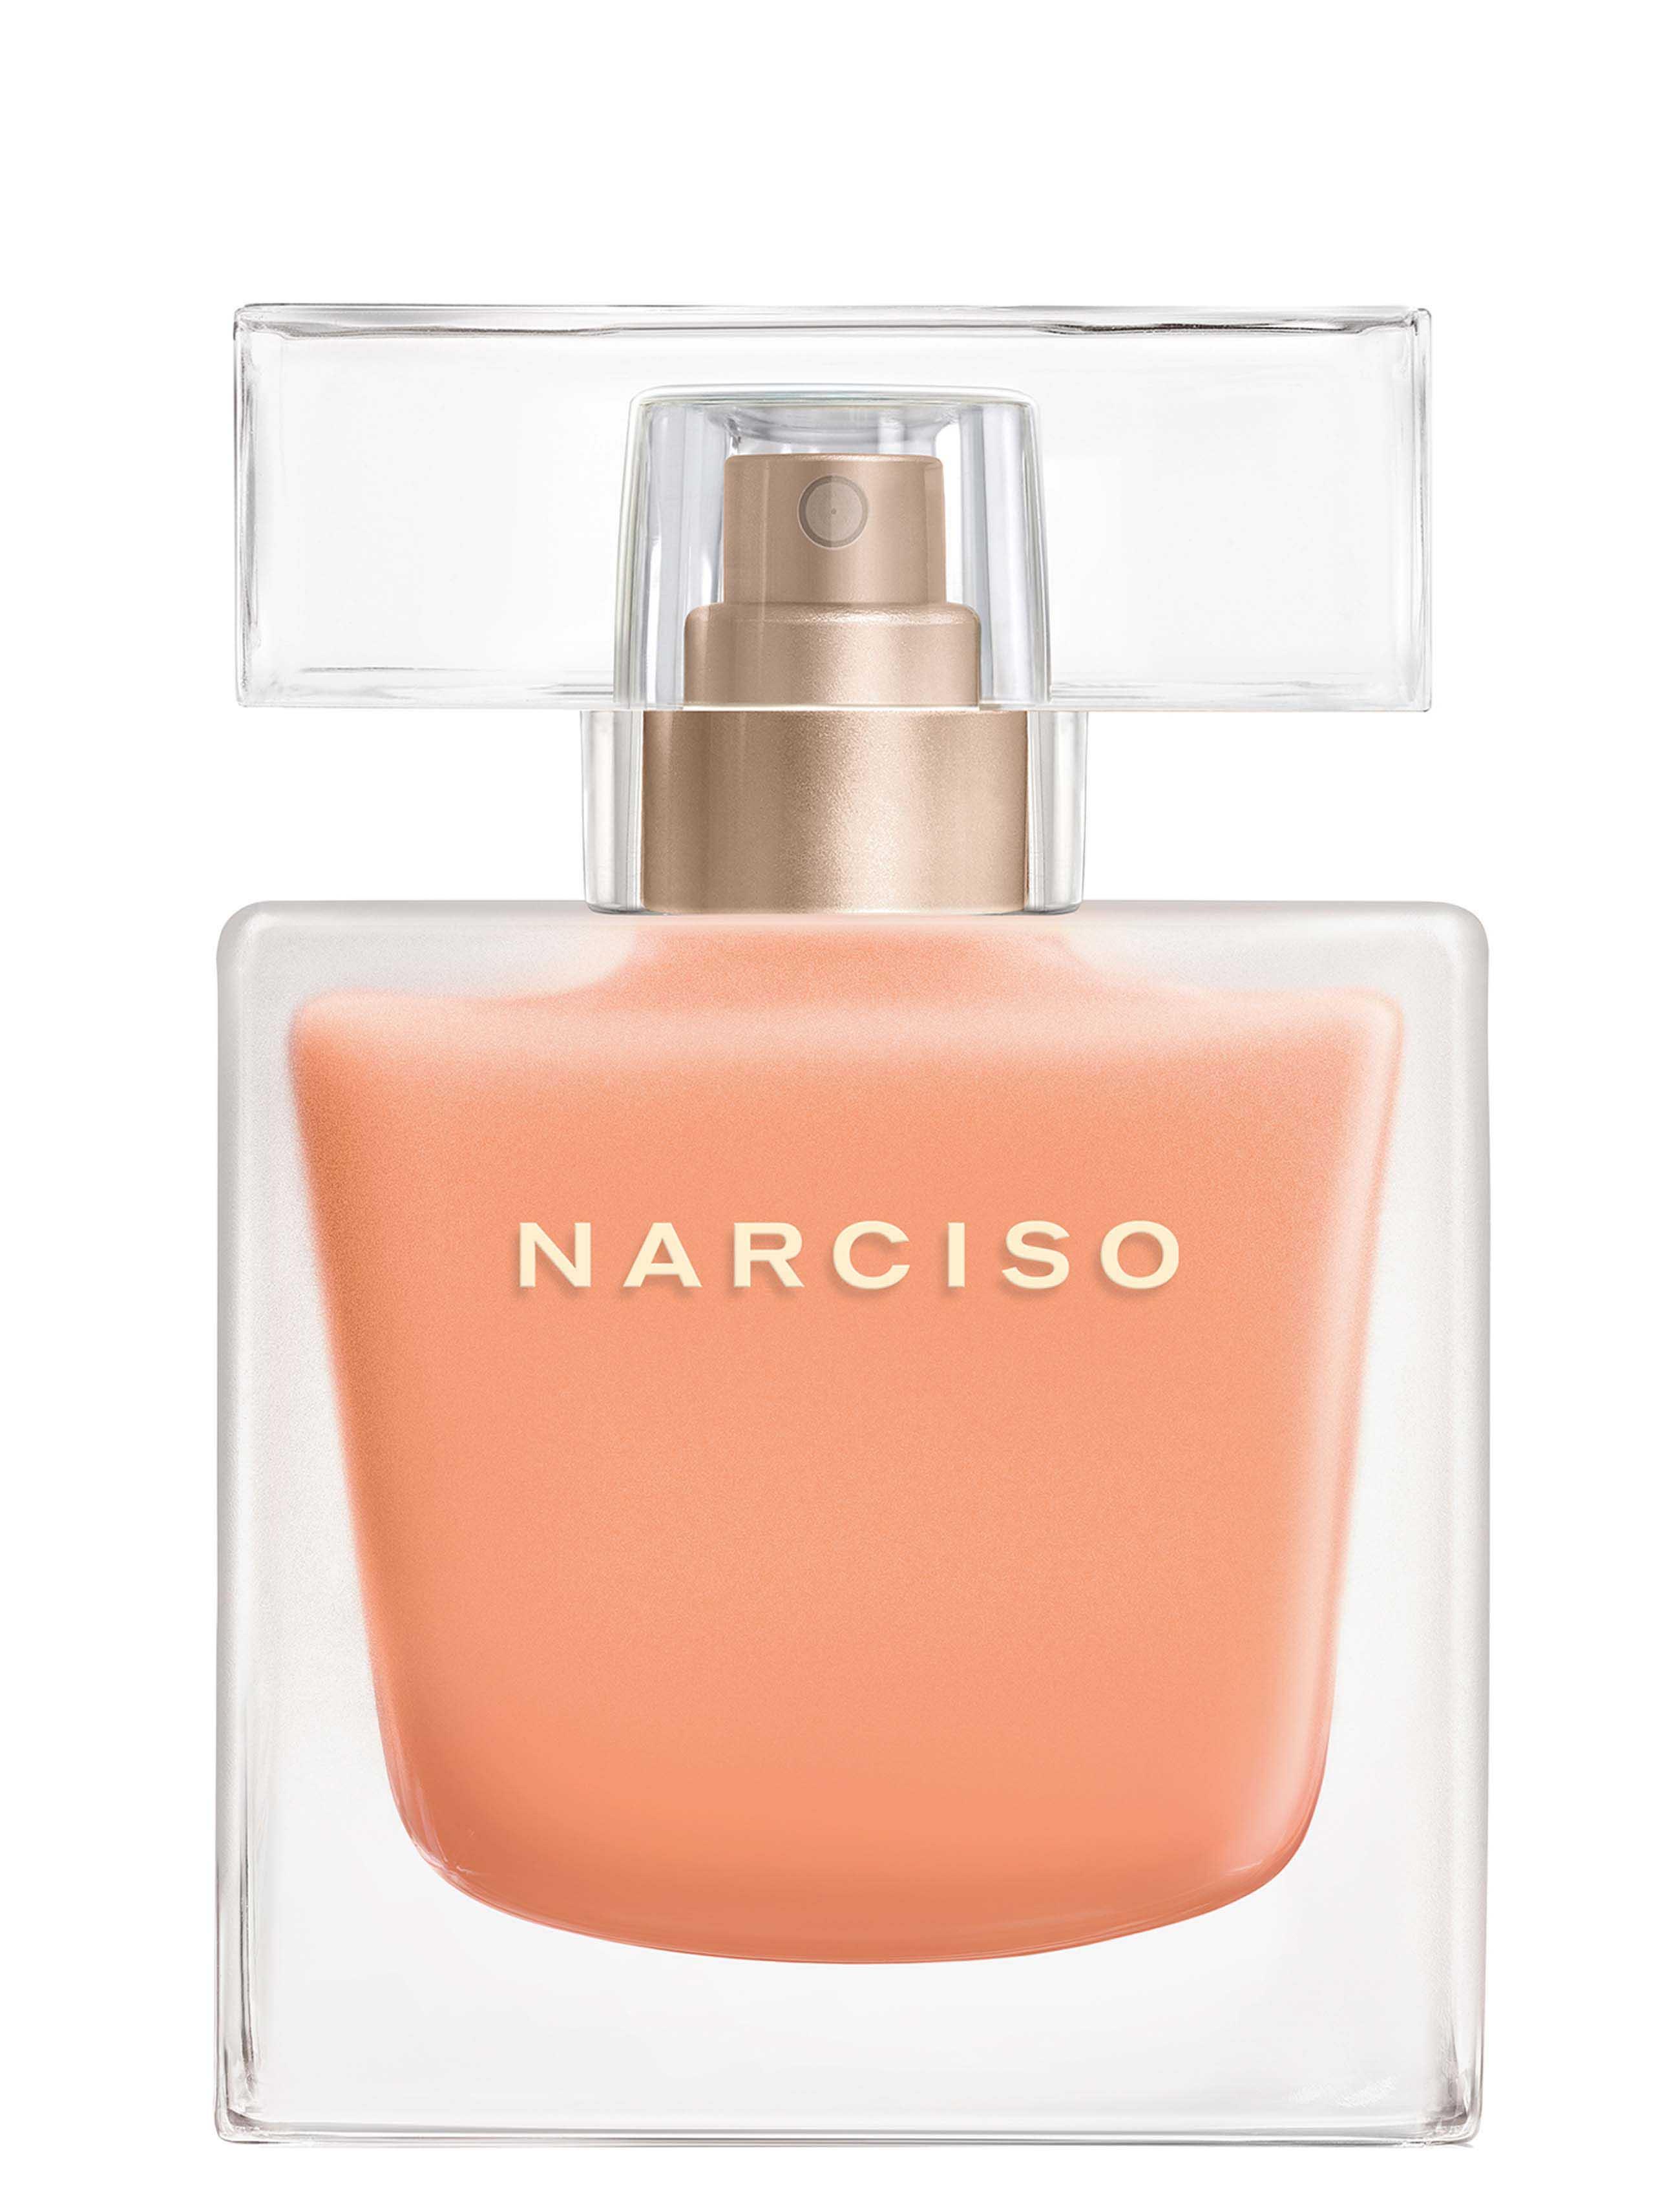 Narciso Rodriguez Narciso Néroli Ambree EDT, 30 ,ml